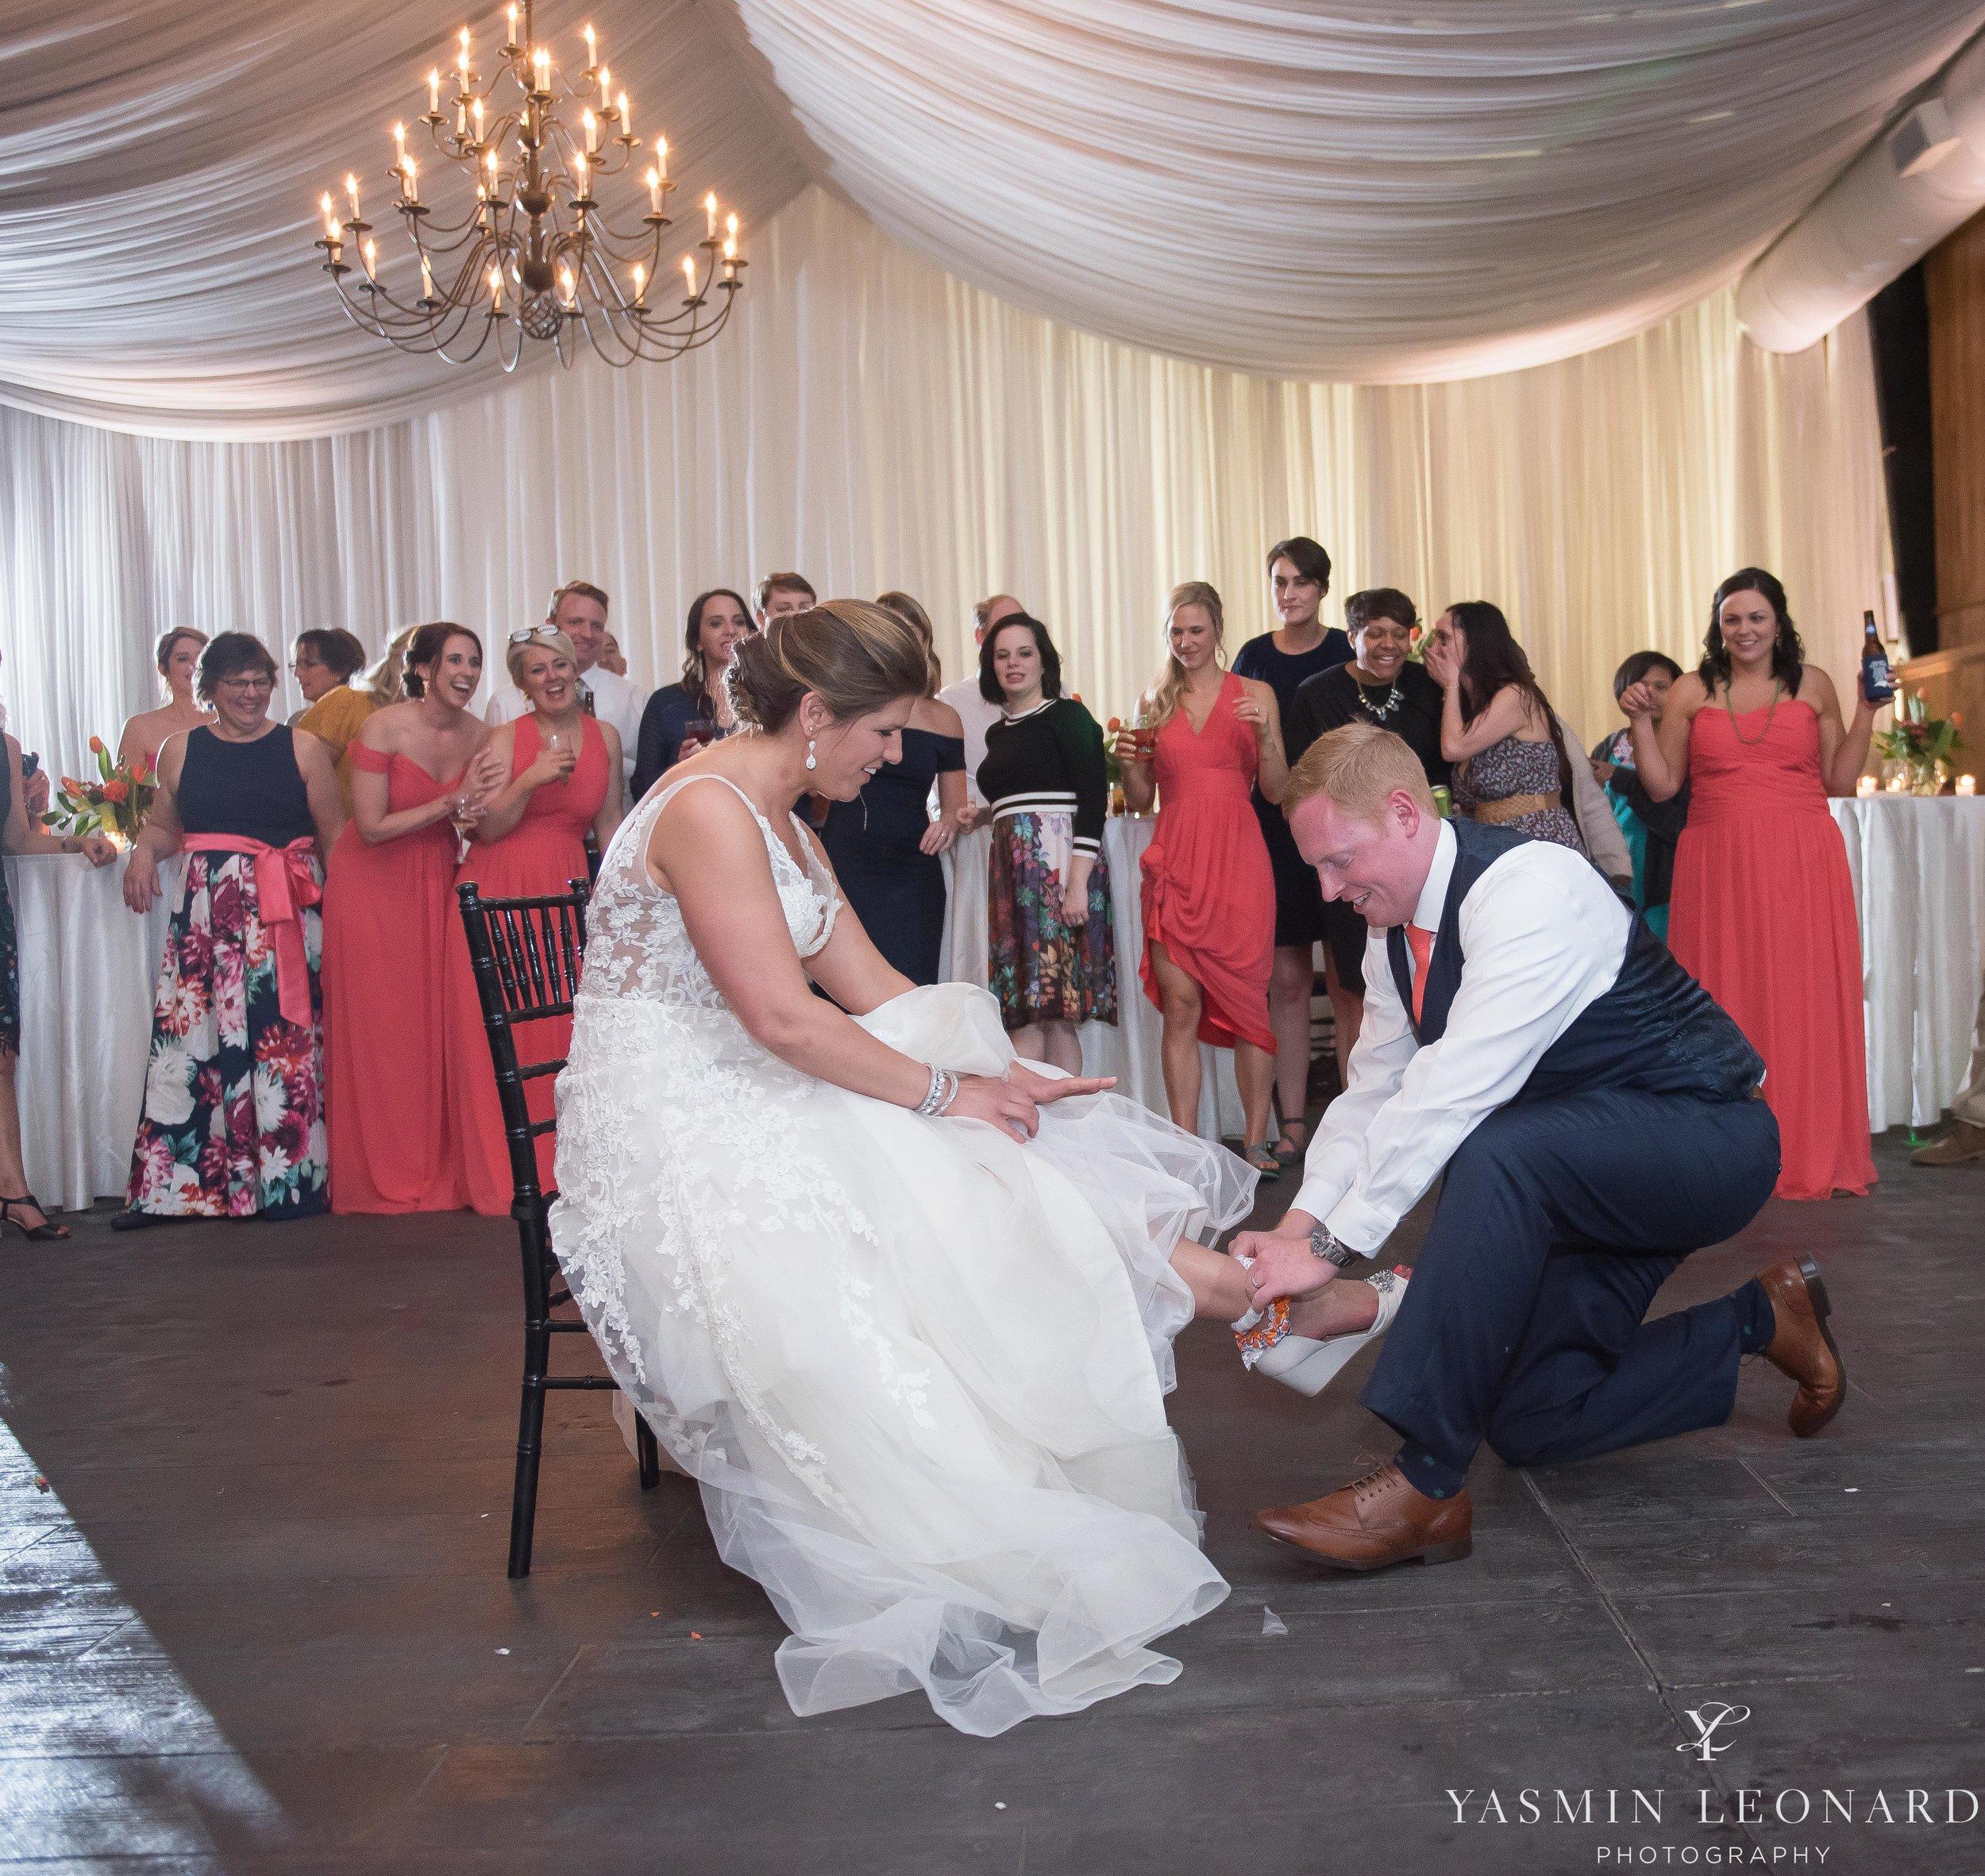 Adaumont Farm - Adaumont Farm Weddings - Trinity Weddings - NC Weddings - Yasmin Leonard Photography-93.jpg